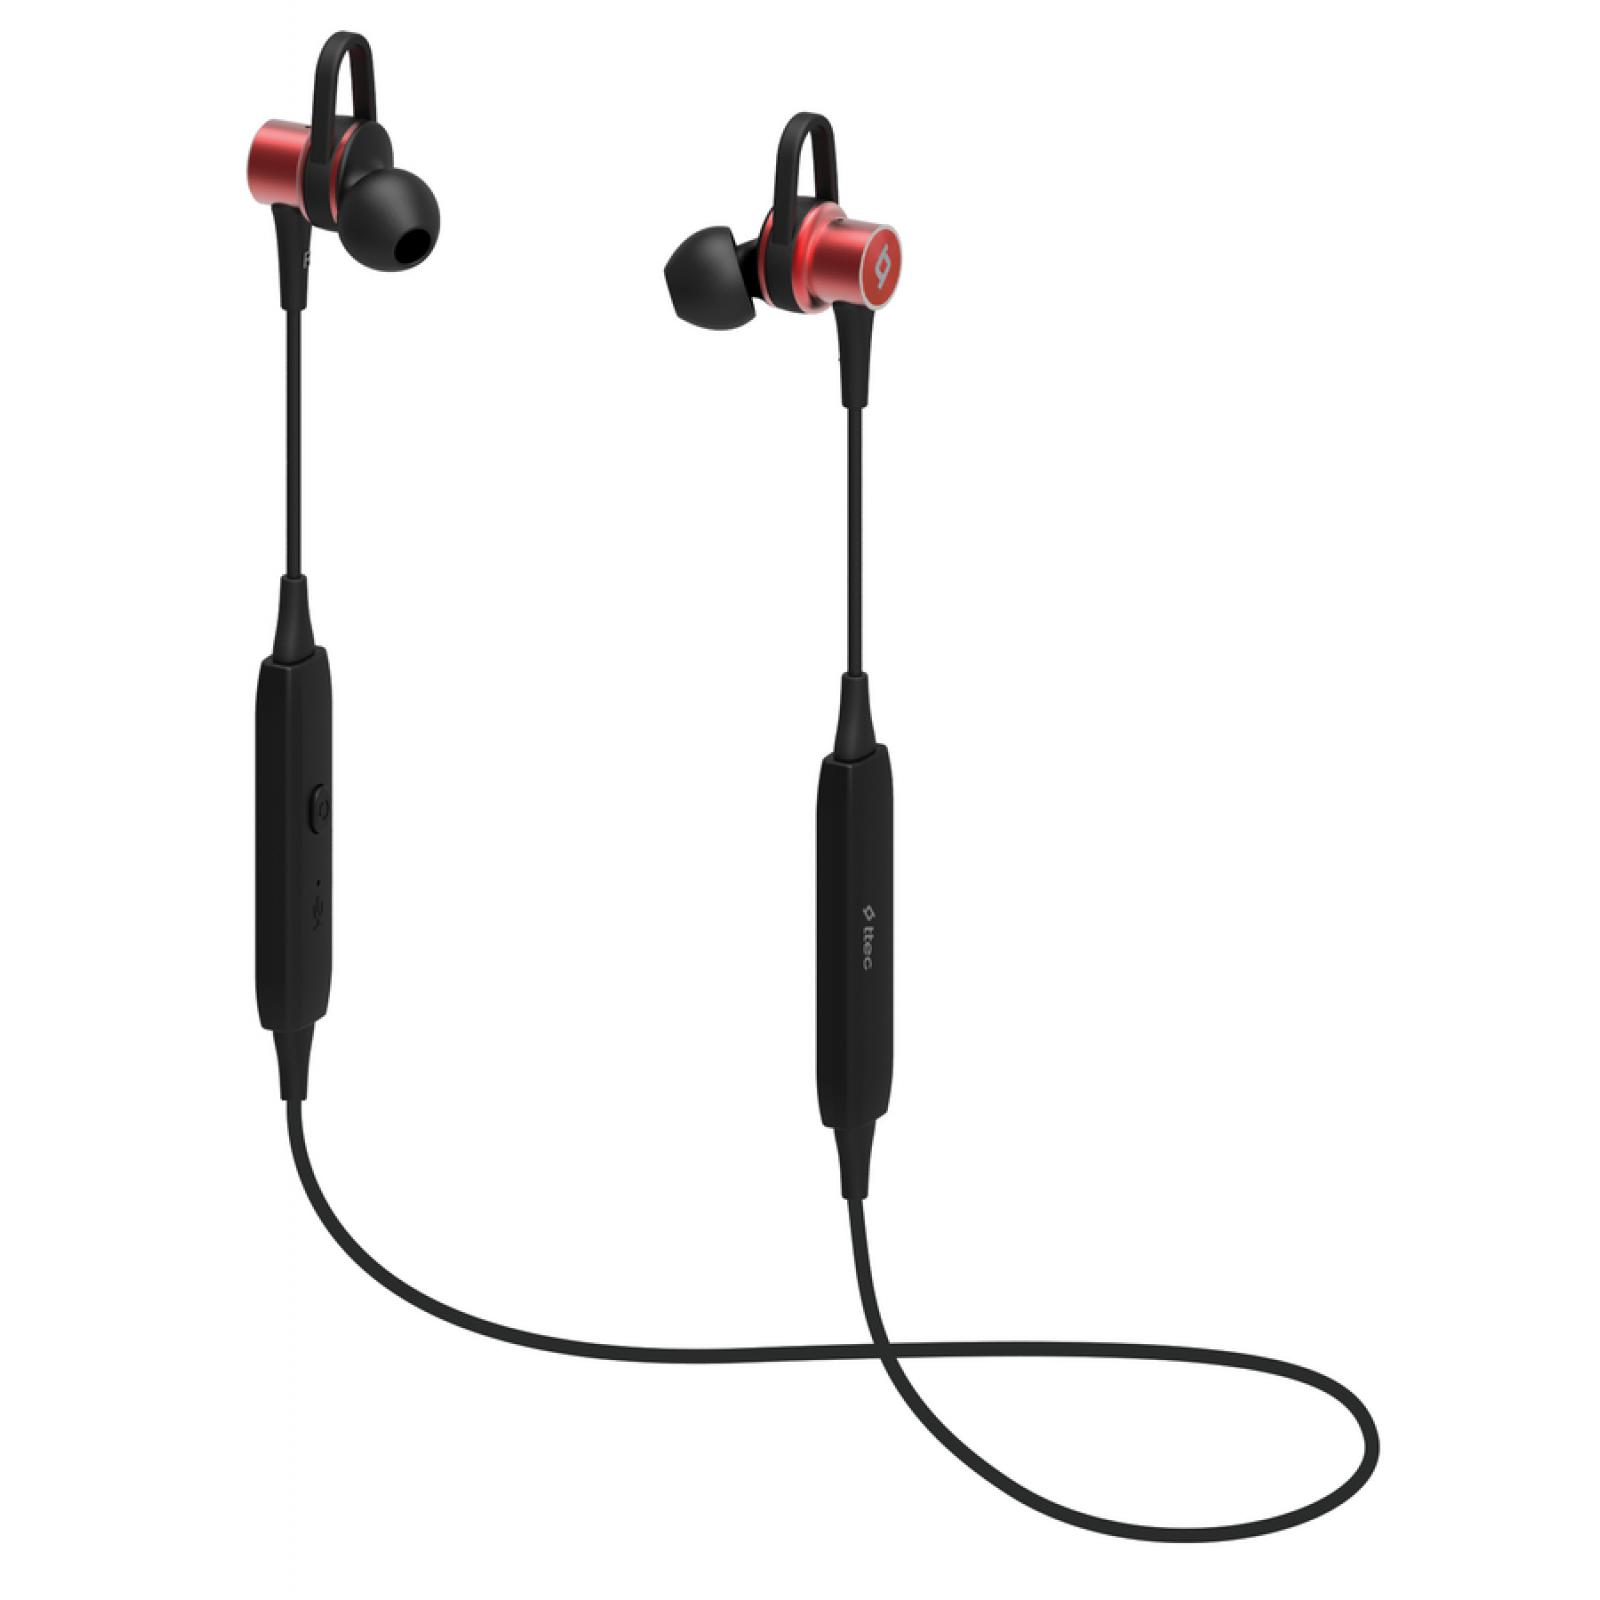 Bluetooth слушалки Soundbeat Pro Wireless BT Stereo Headset magnets - Червени,116261